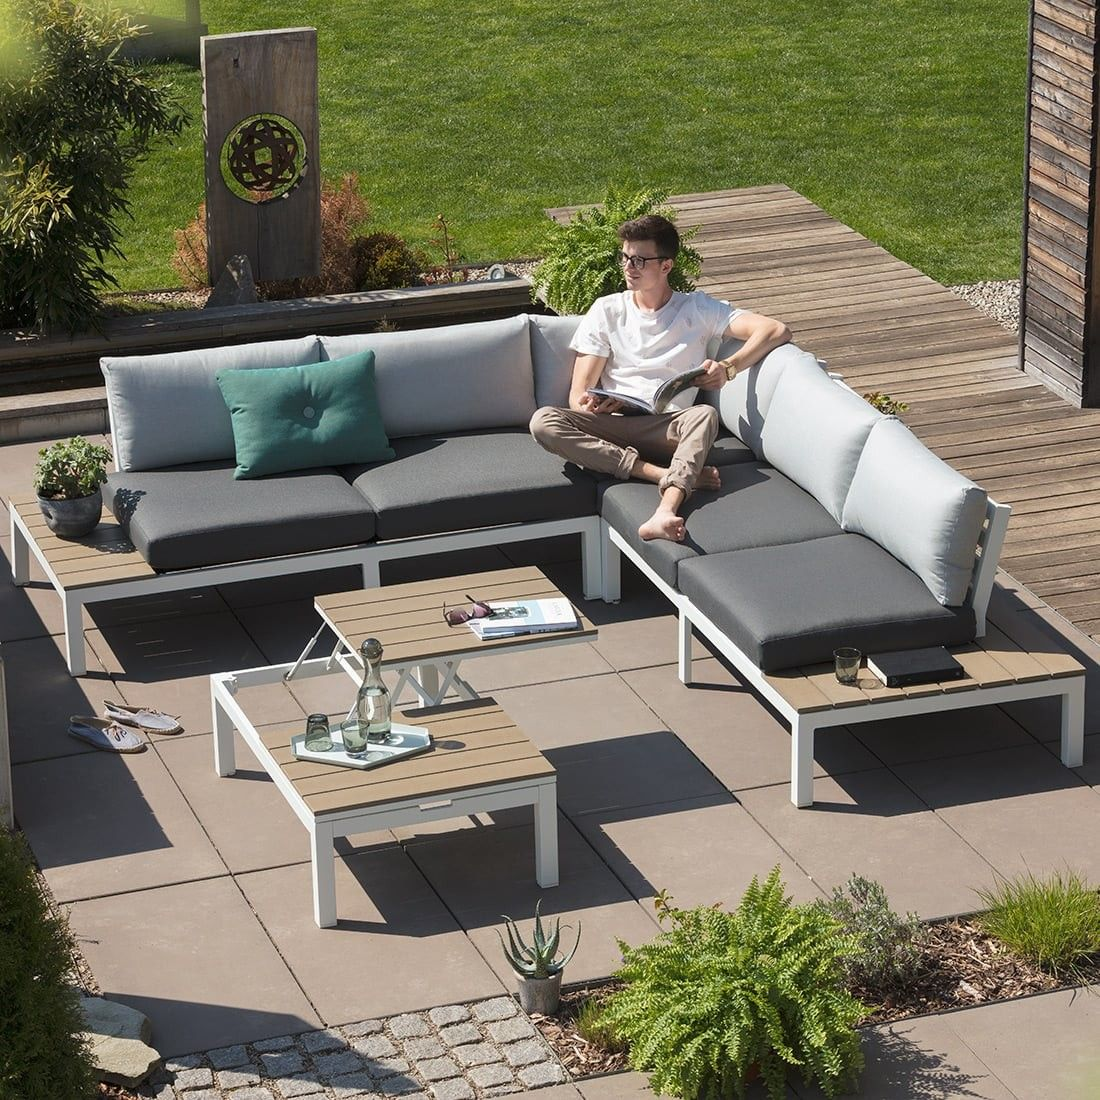 Exklusive Gartenmobel Outliv Hamilton Loungemobel Polyrattan 5 Tlg Loungeset Gartenlounge Lounge Outdoor Lounge Mobel Gartenmobel Lounge Set Garten Lounge Set